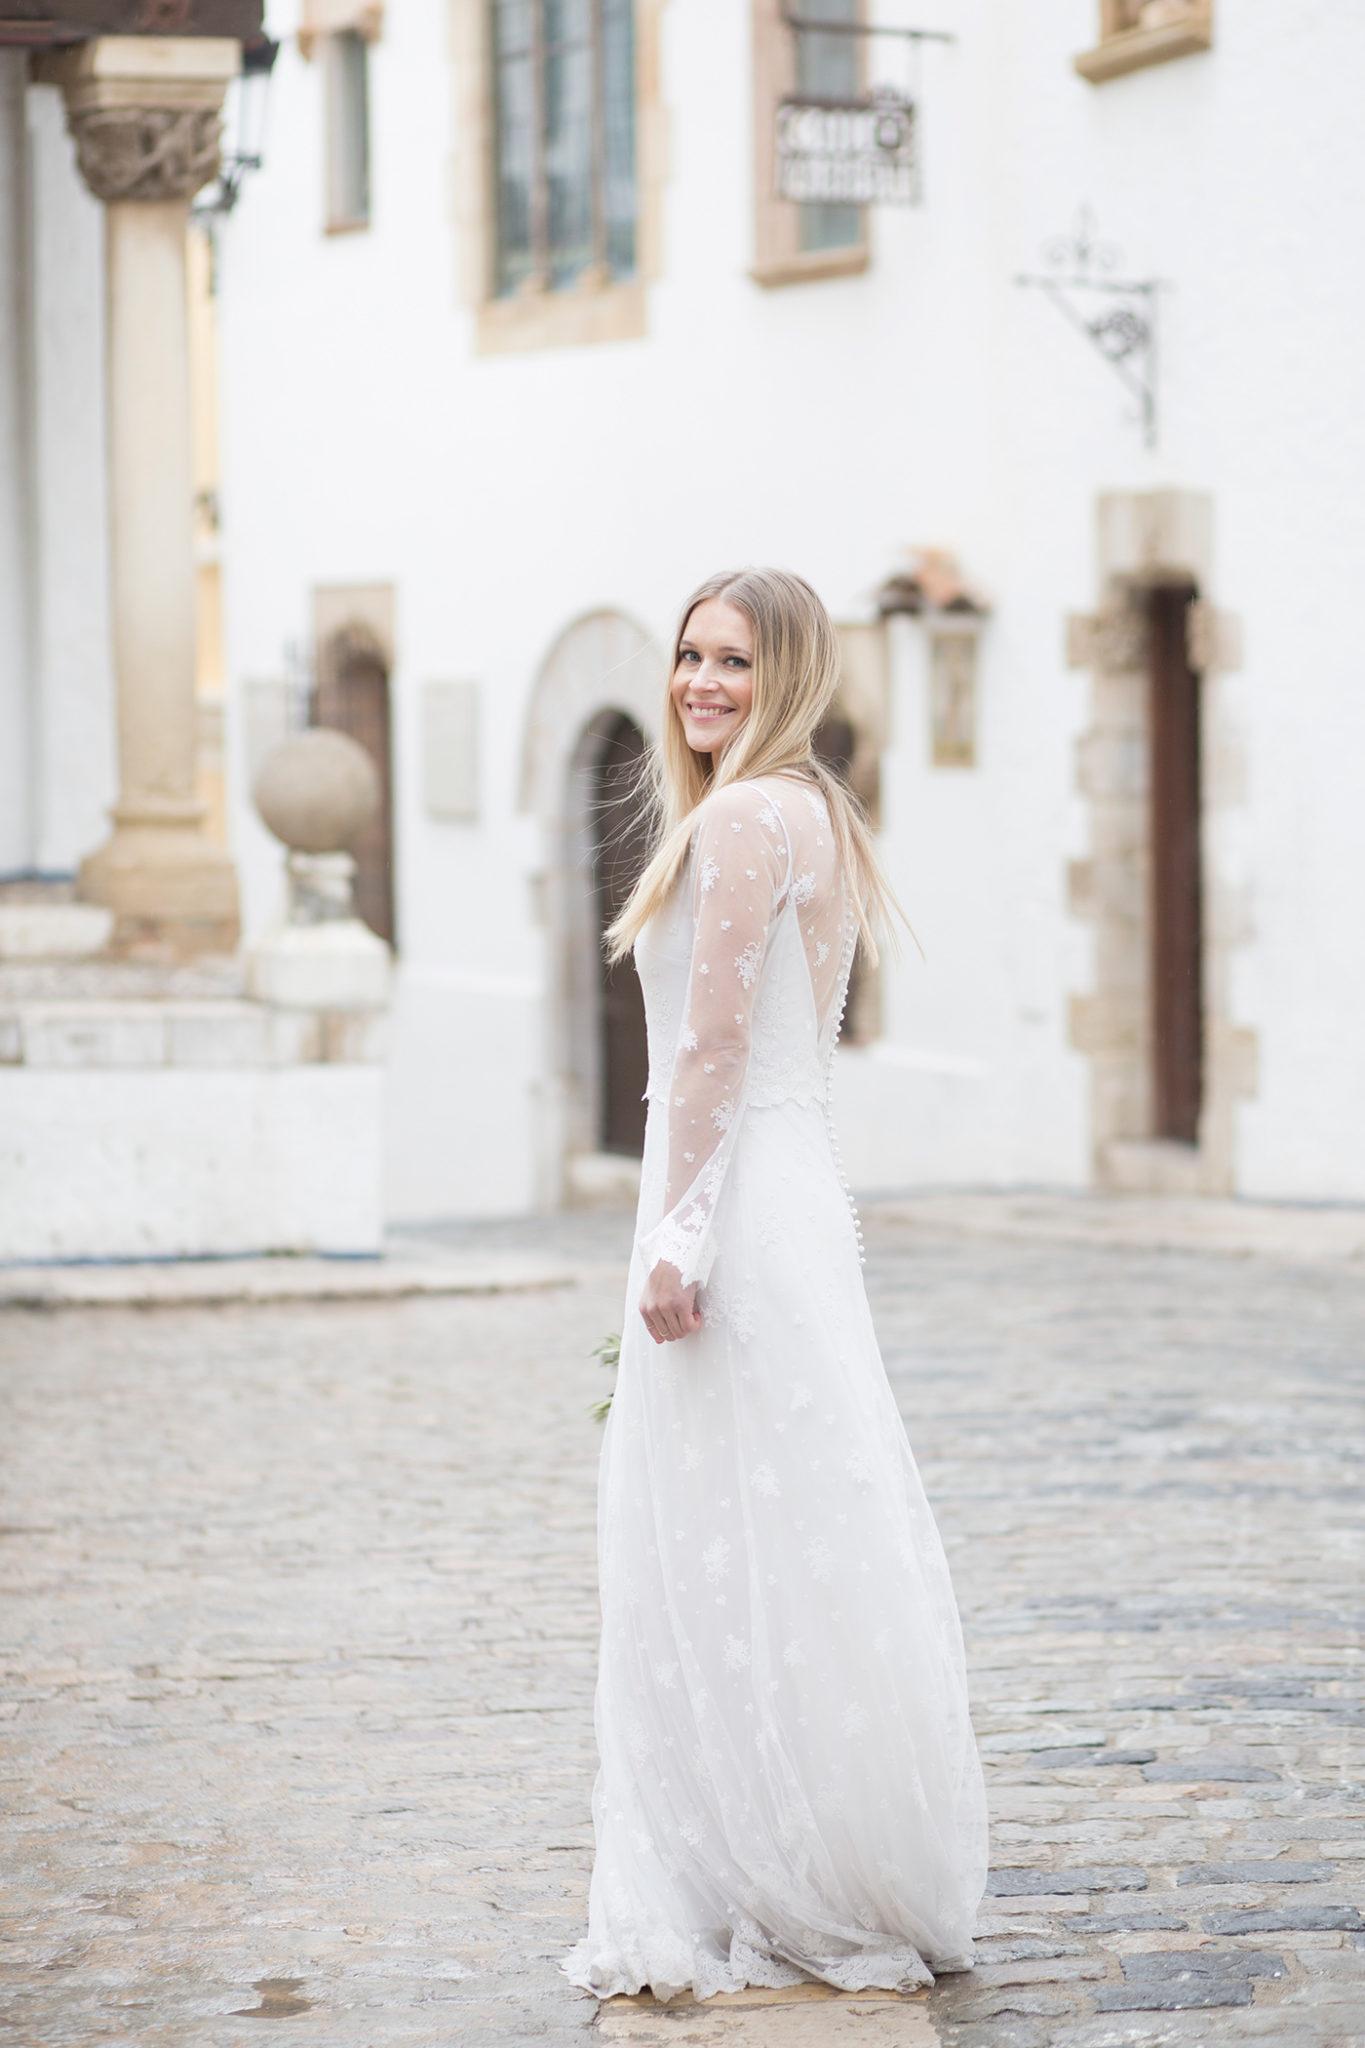 Wedding photographer Sitges and Barcelona